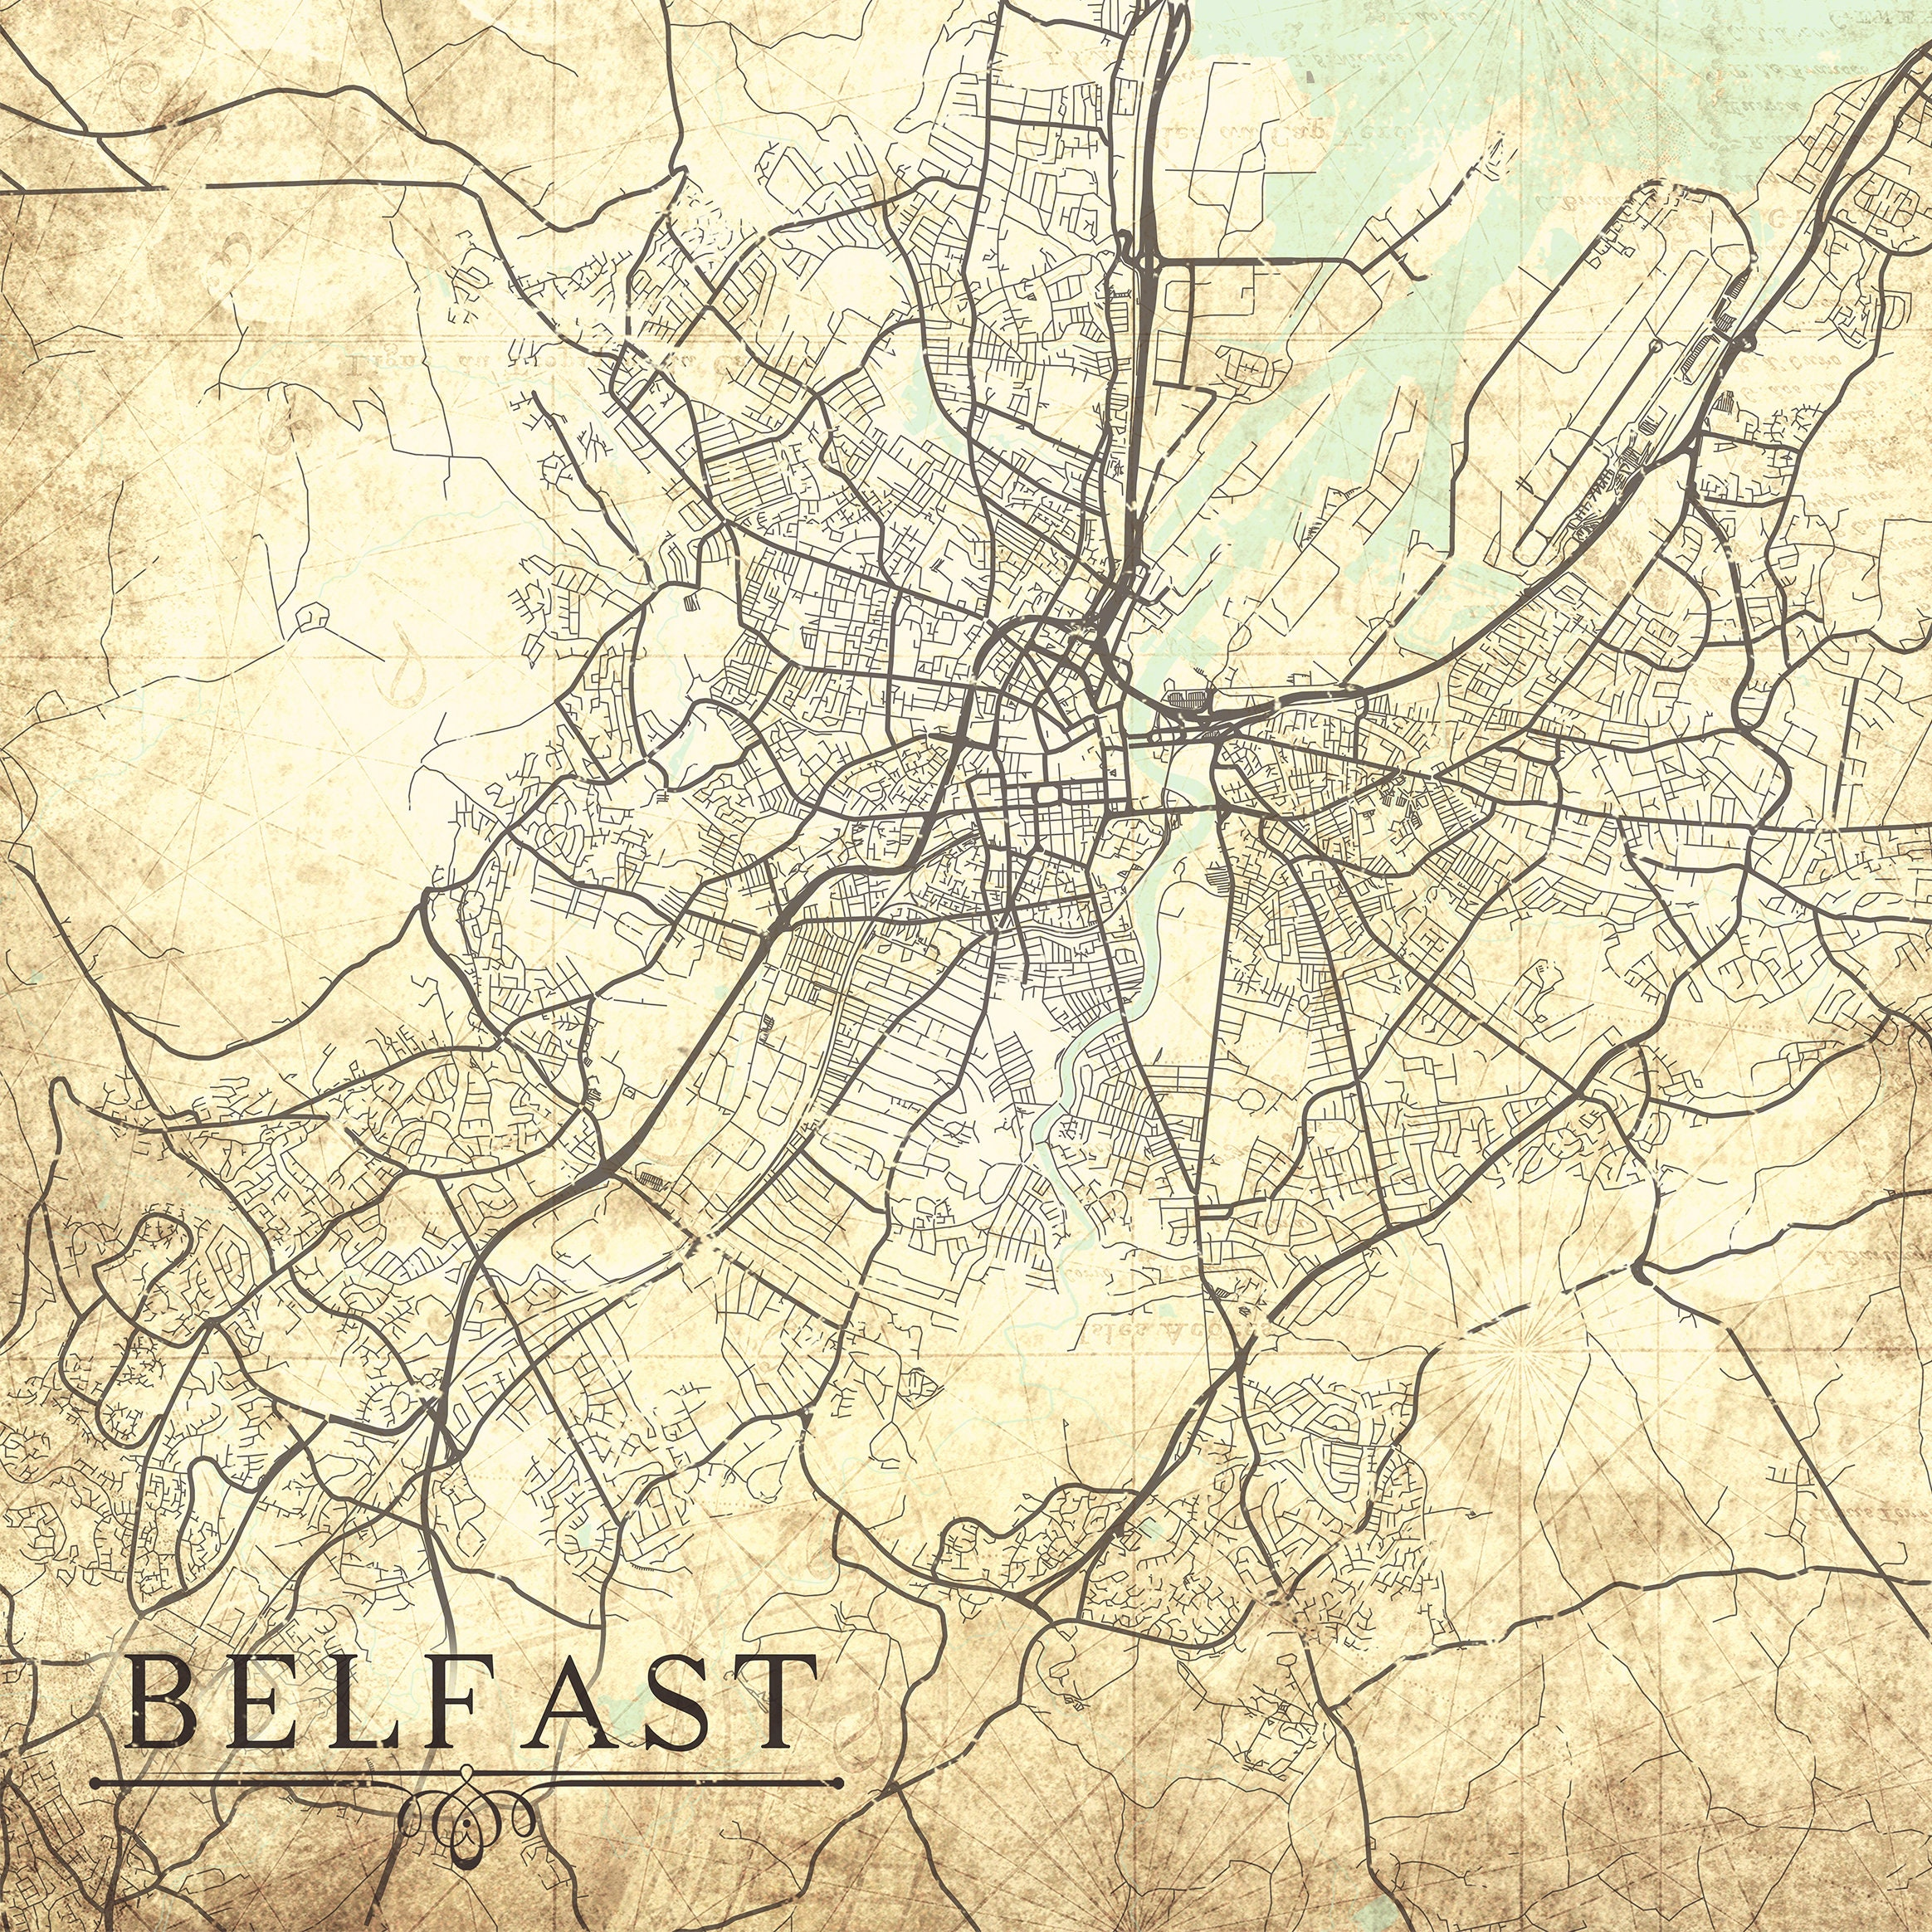 BELFAST Canvas Print UK Ireland Vintage map Belfast City ... on goteborg city map, erfurt city map, ellsworth city map, cuenca city map, limassol city map, solitude city map, rijeka city map, a coruna city map, bolivar city map, waterville city map, delray beach city map, bulawayo city map, fortaleza city map, alma city map, santos city map, ennis city map, dingle city map, fife city map, pomeroy city map, yantai city map,